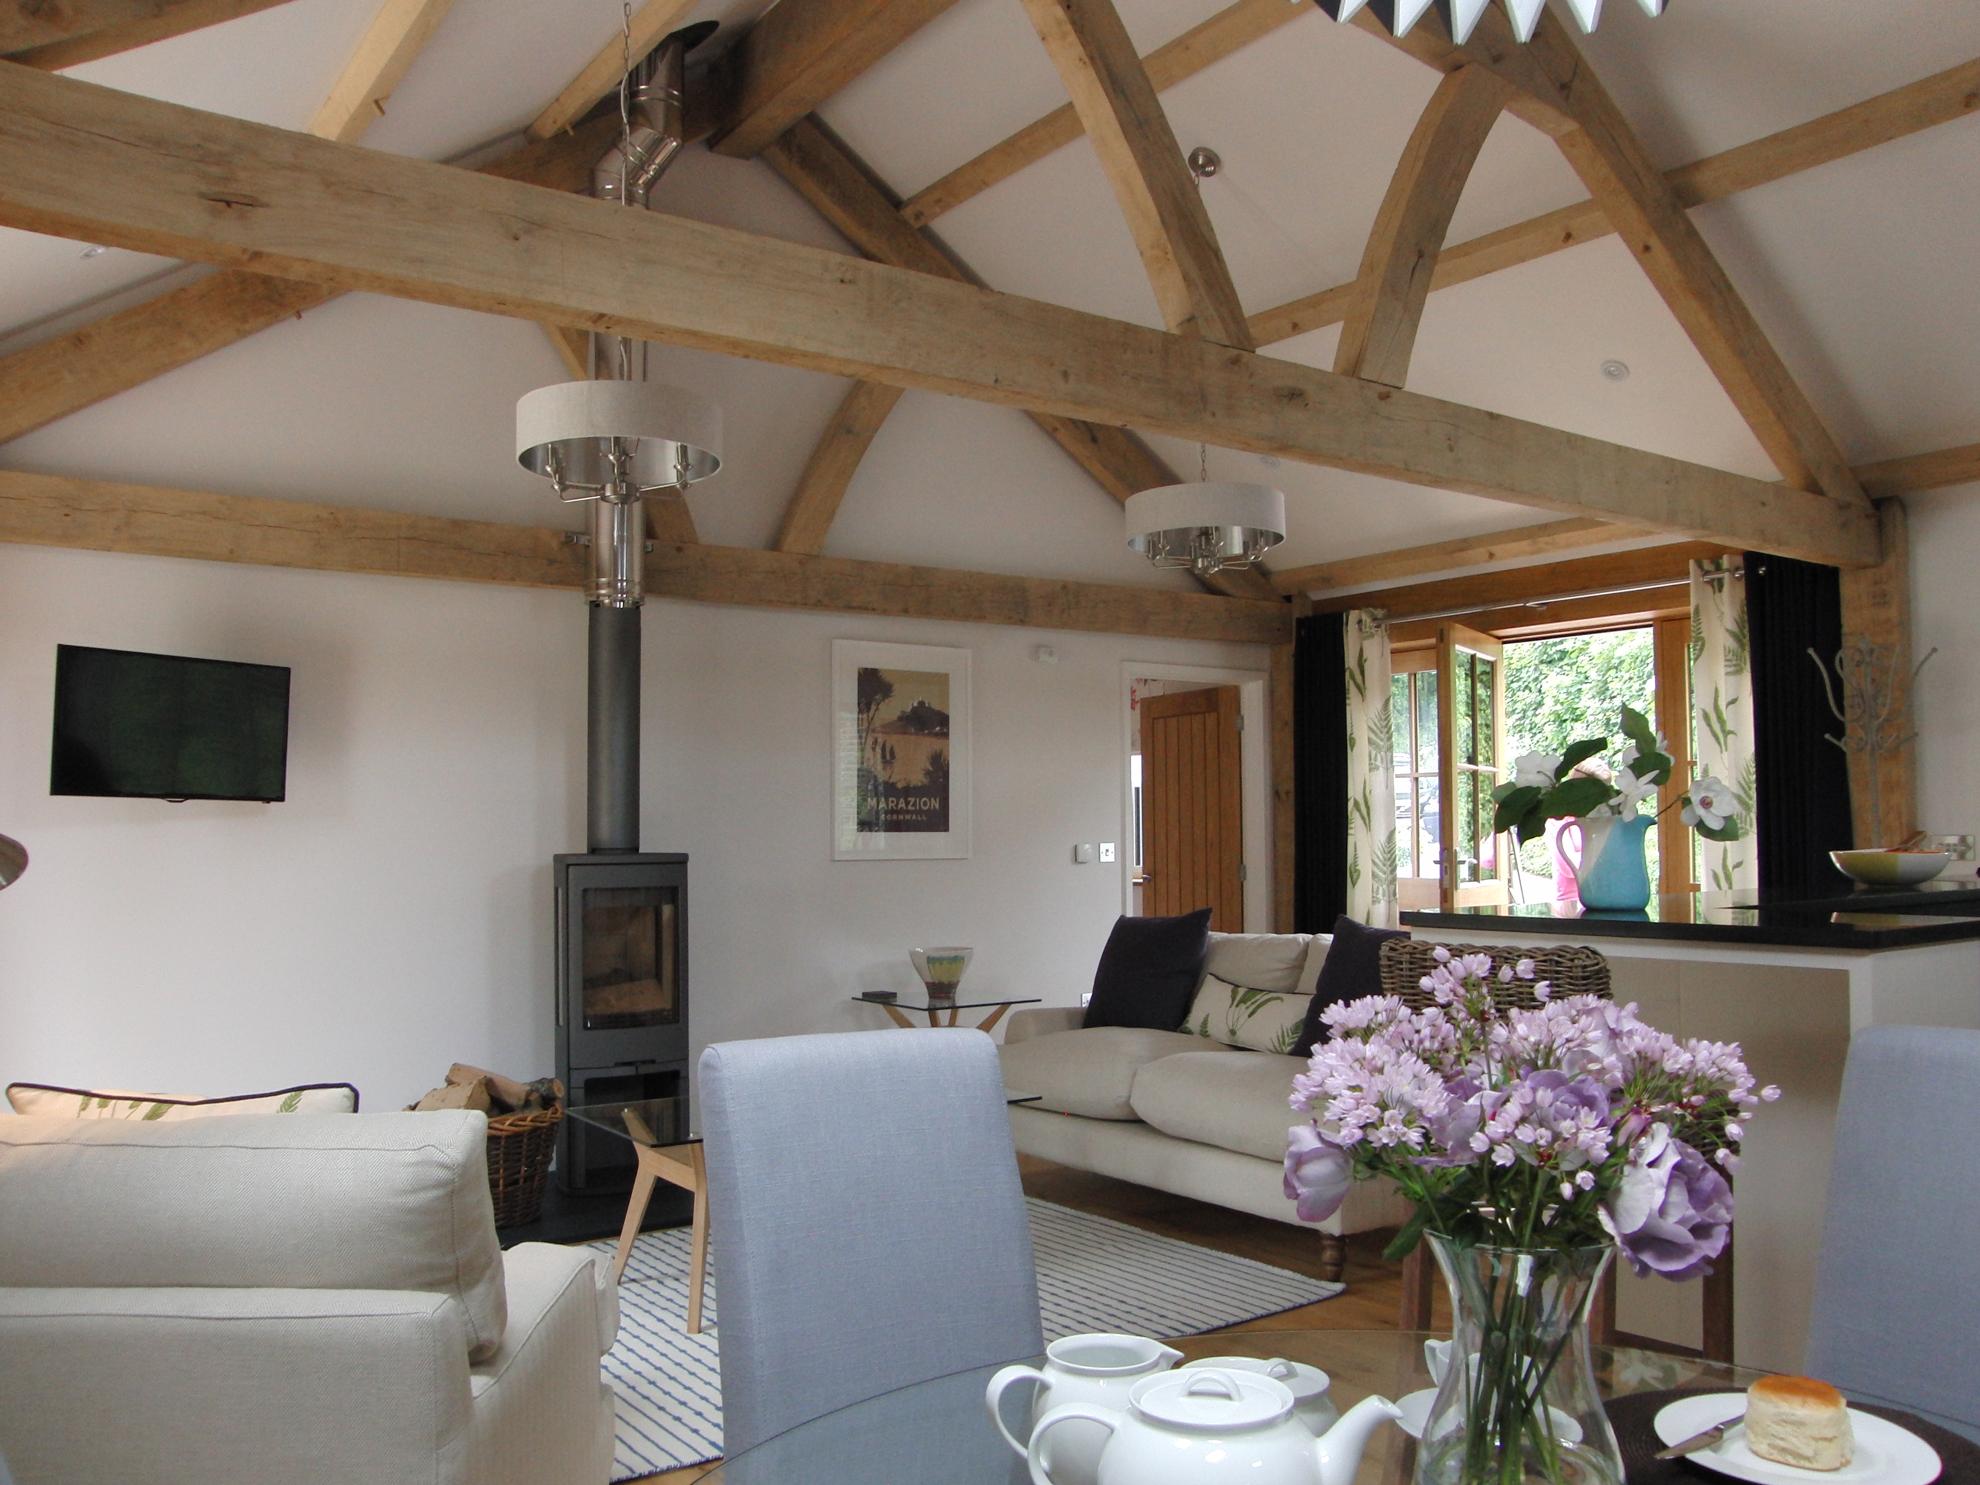 interior-prideaux-holiday-unit2